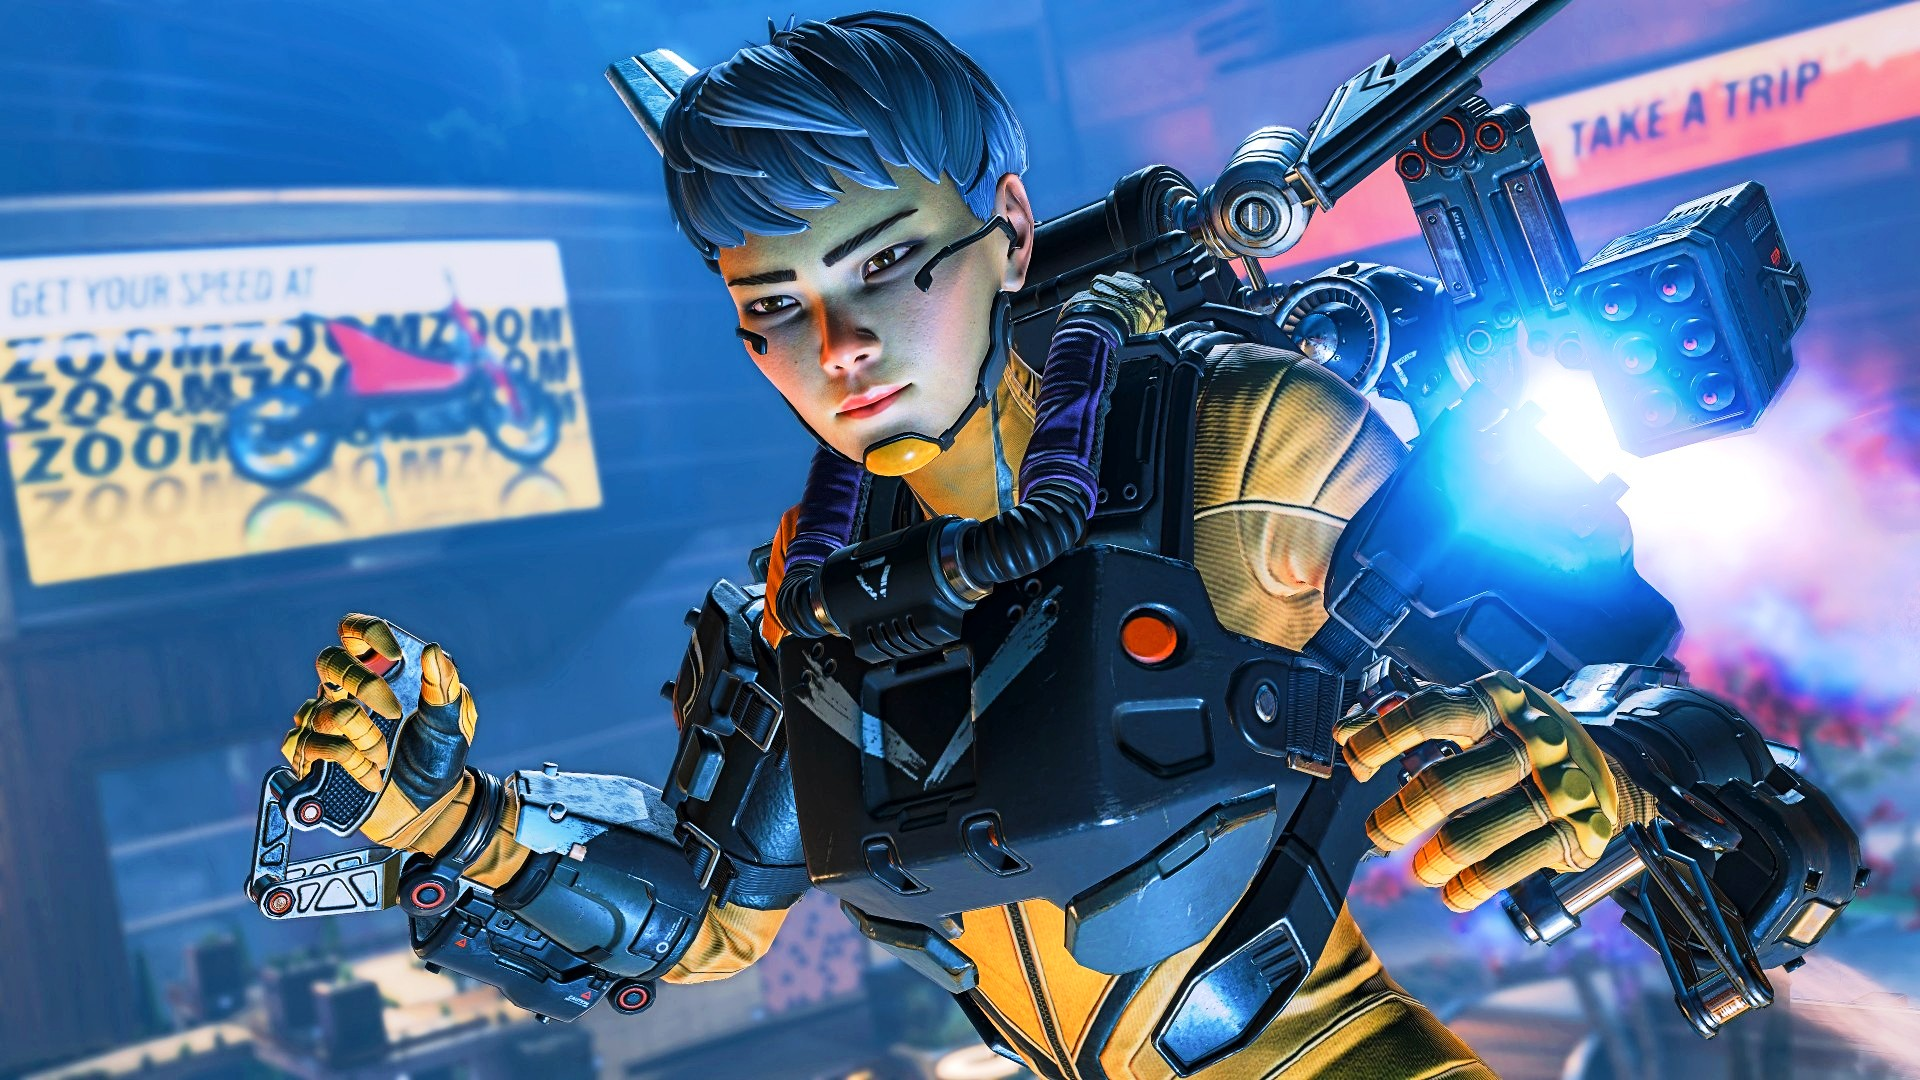 Apex Legends sets new Steam record following Season 9 launch